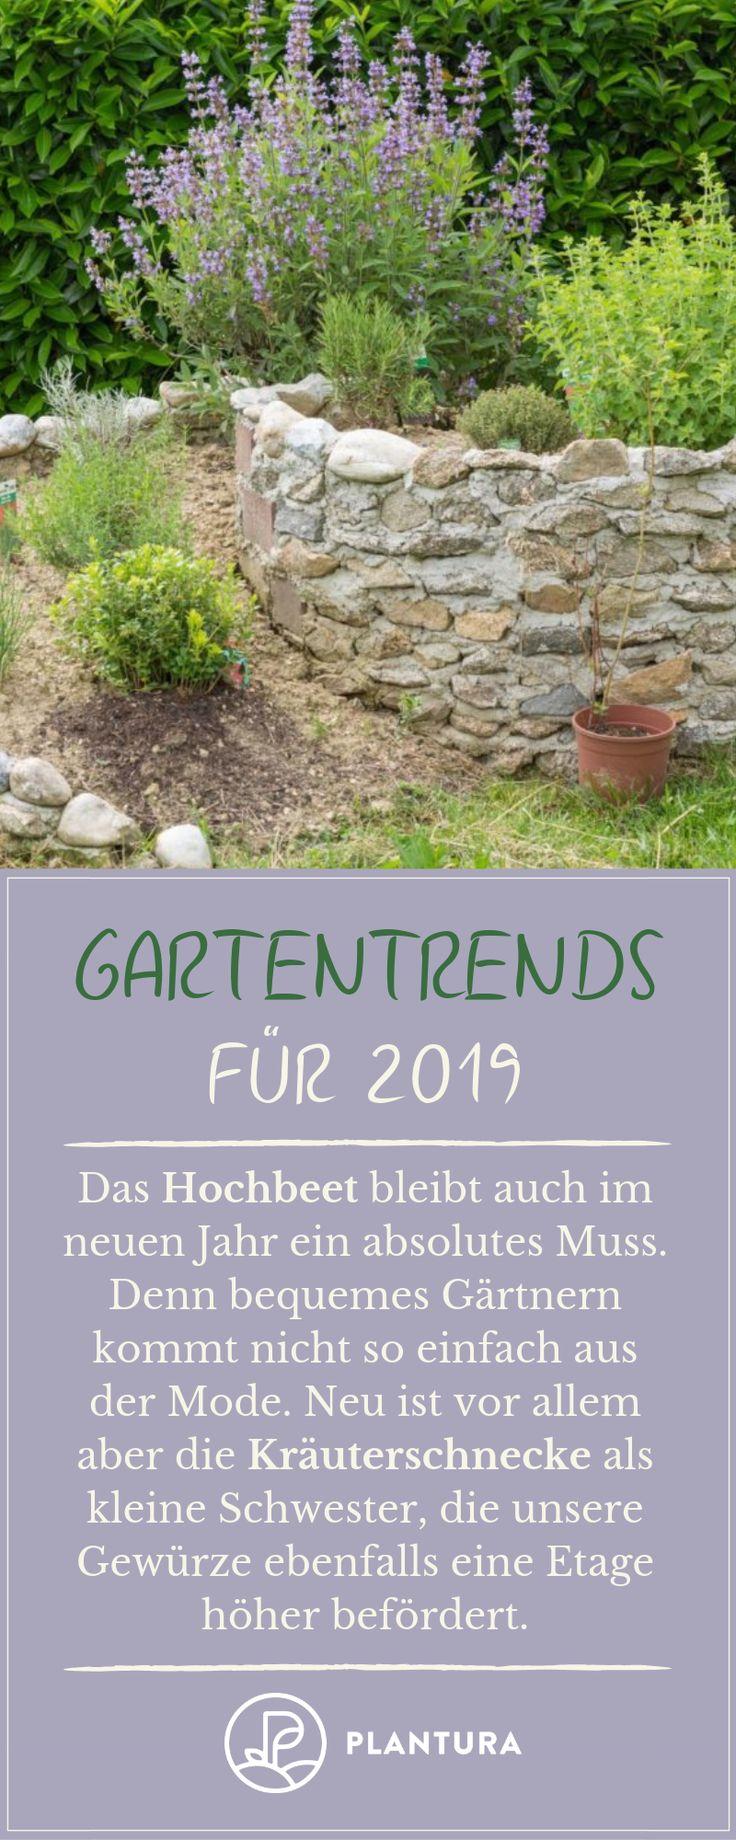 Garden Trends 2019 – Hochbeet & Kräuterschnecke: 2019 ist wieder da, …   – Gartenblogs – Gruppenboard